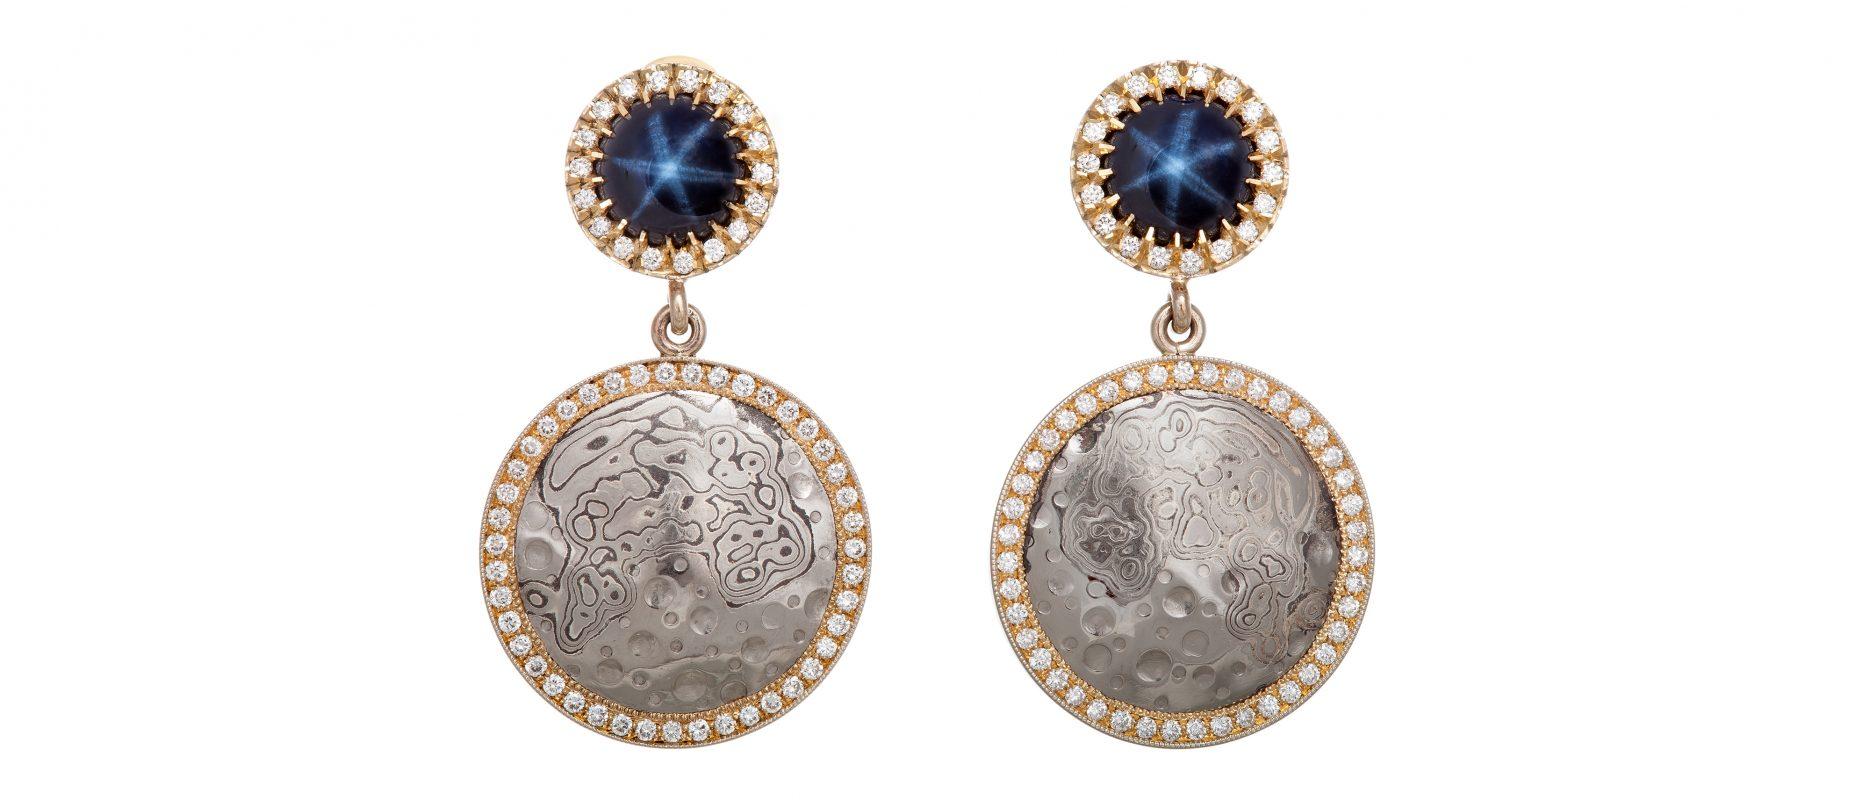 Selene-high-jewellery-1